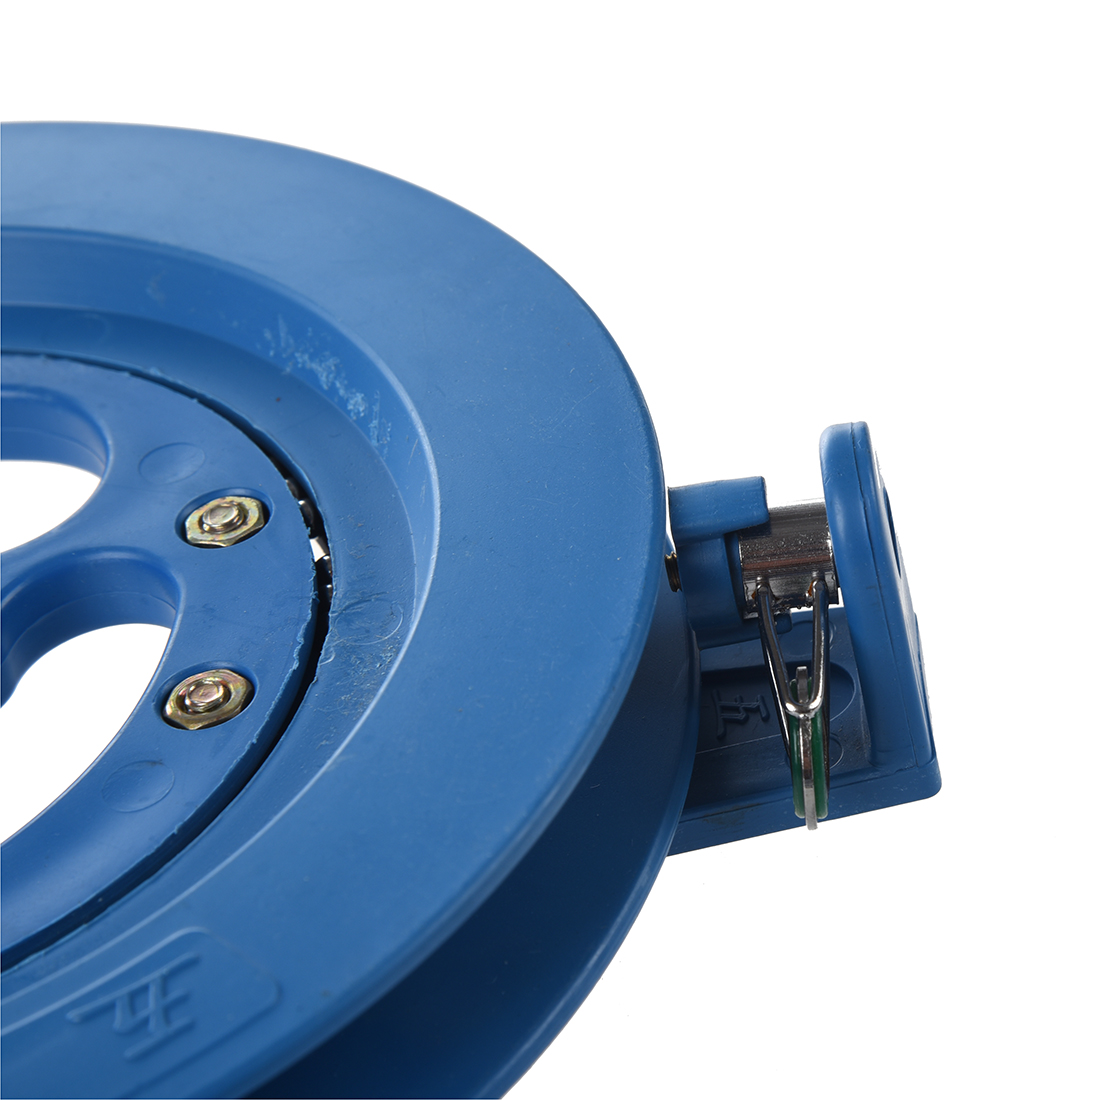 New-Blue-Outdoor-Kite-Tool-Ballbearing-Blue-Plastic-Reel-Line-Winder-3